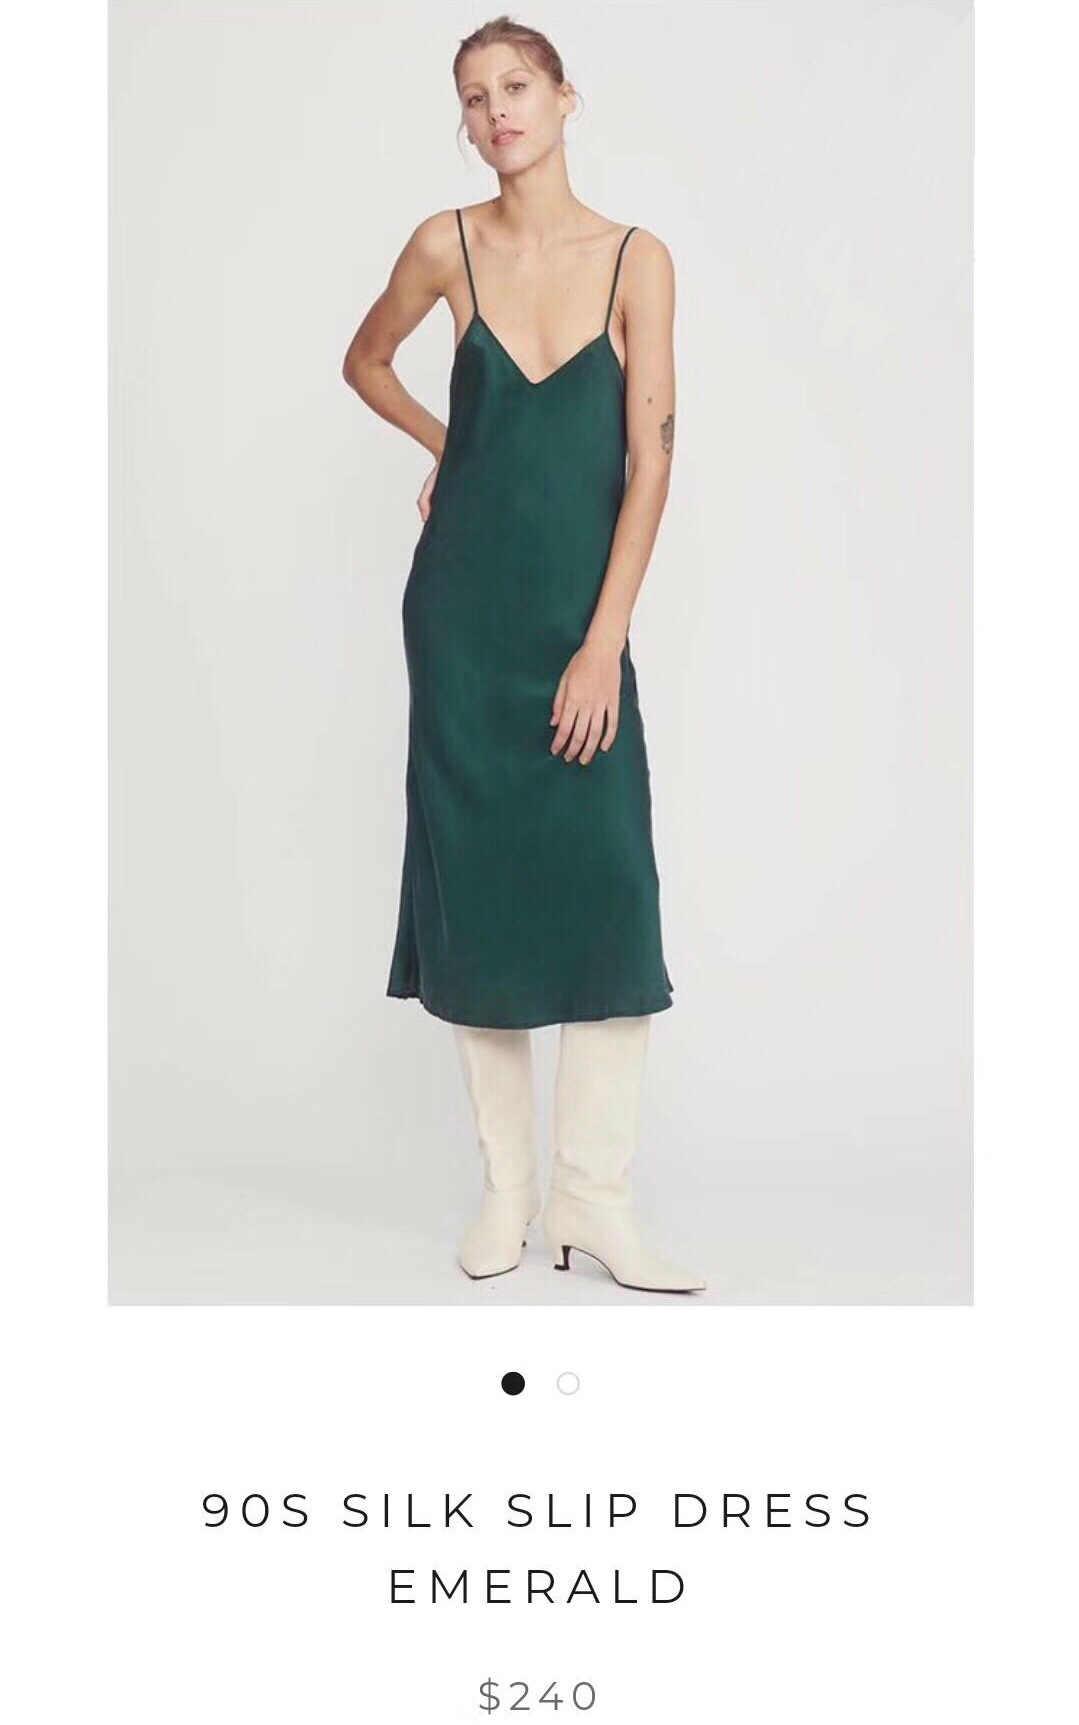 3b9663ca91d99 Heavy Silk Suspender dress 2019 Early Spring Style Oblique Cut Silk Heavy  Sand Washing Process Women midi Dress